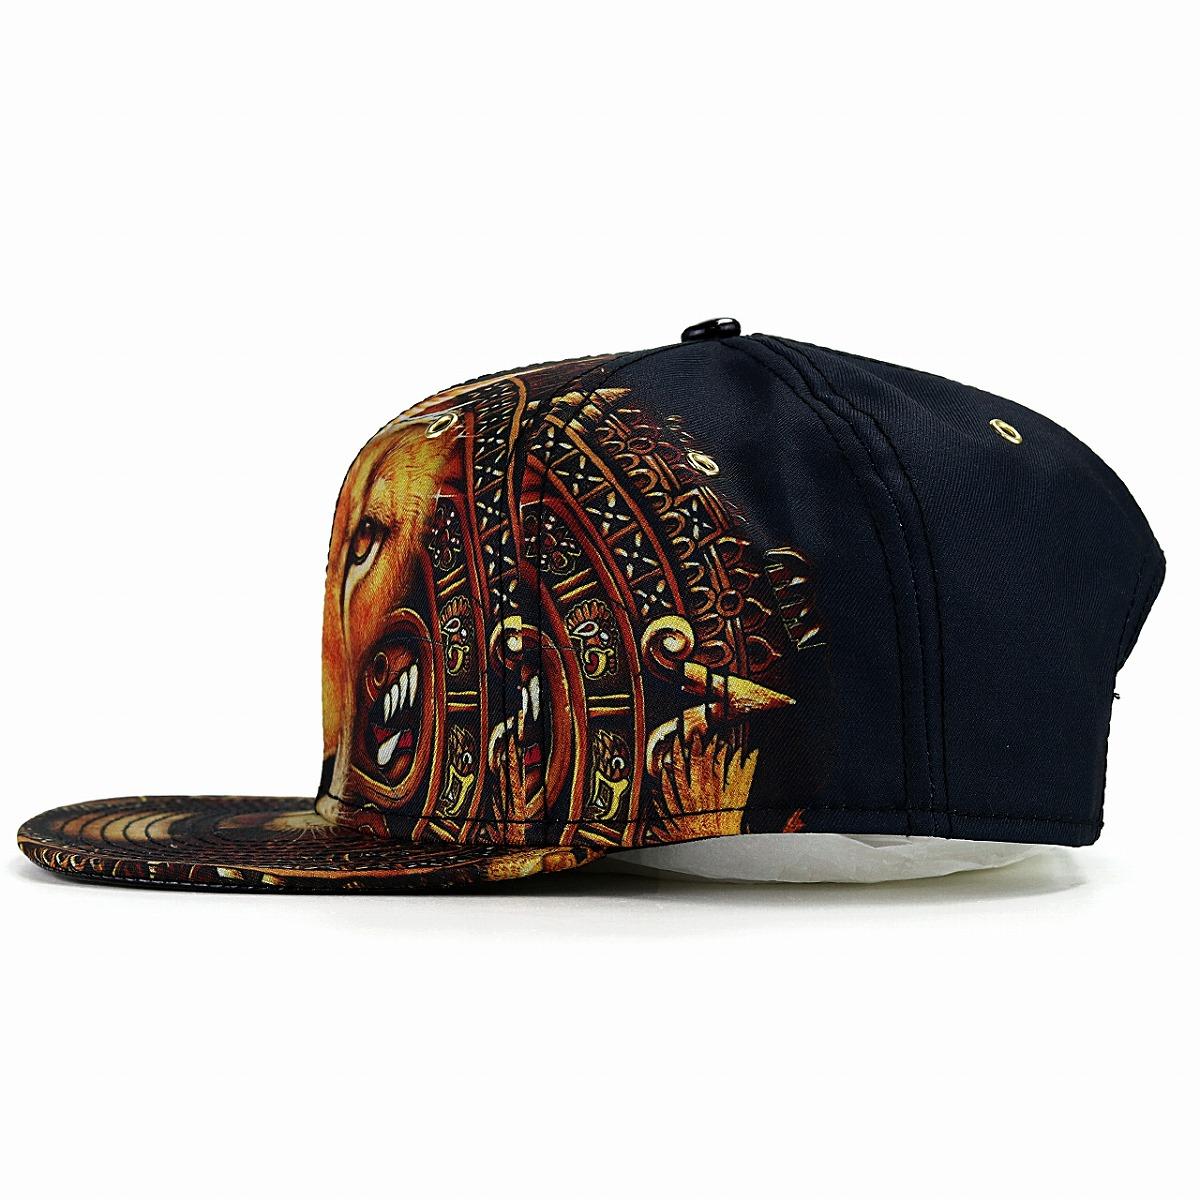 ... Hat men cap lady s import CARLOS SANTANA lion rial Aztec Carlos Santana  animal printed pattern baseball ... 64e5790d8bc